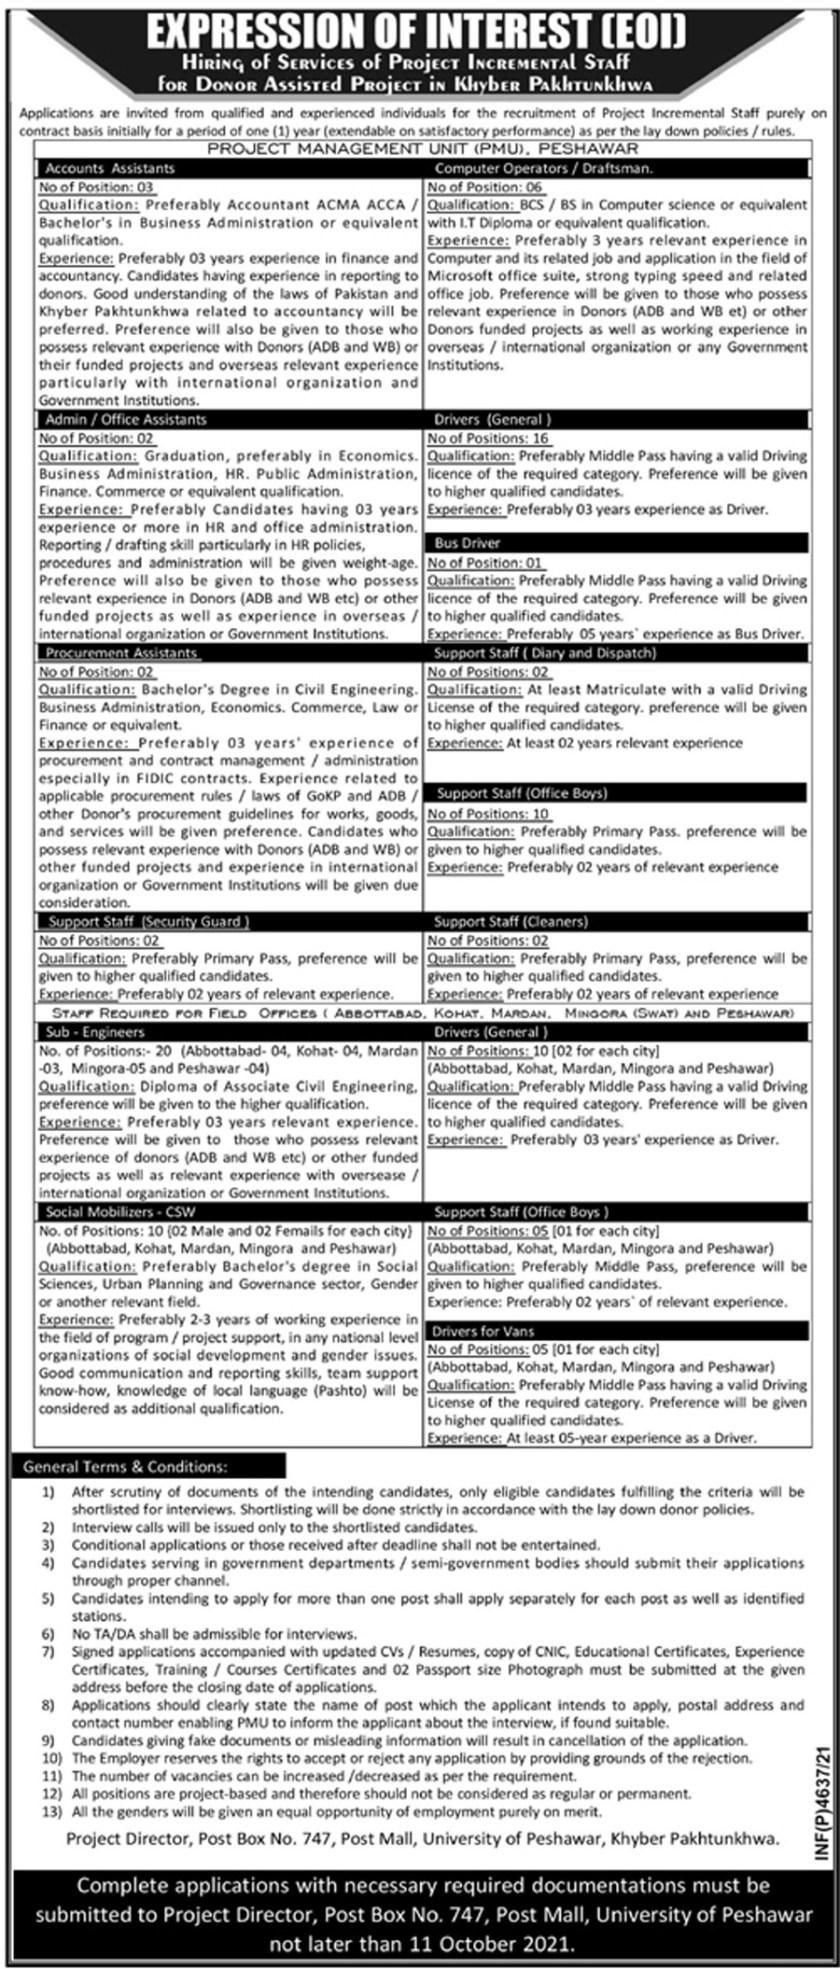 Donor Assisted Project KPK Jobs 2021 - Project Management Unit PMU Jobs